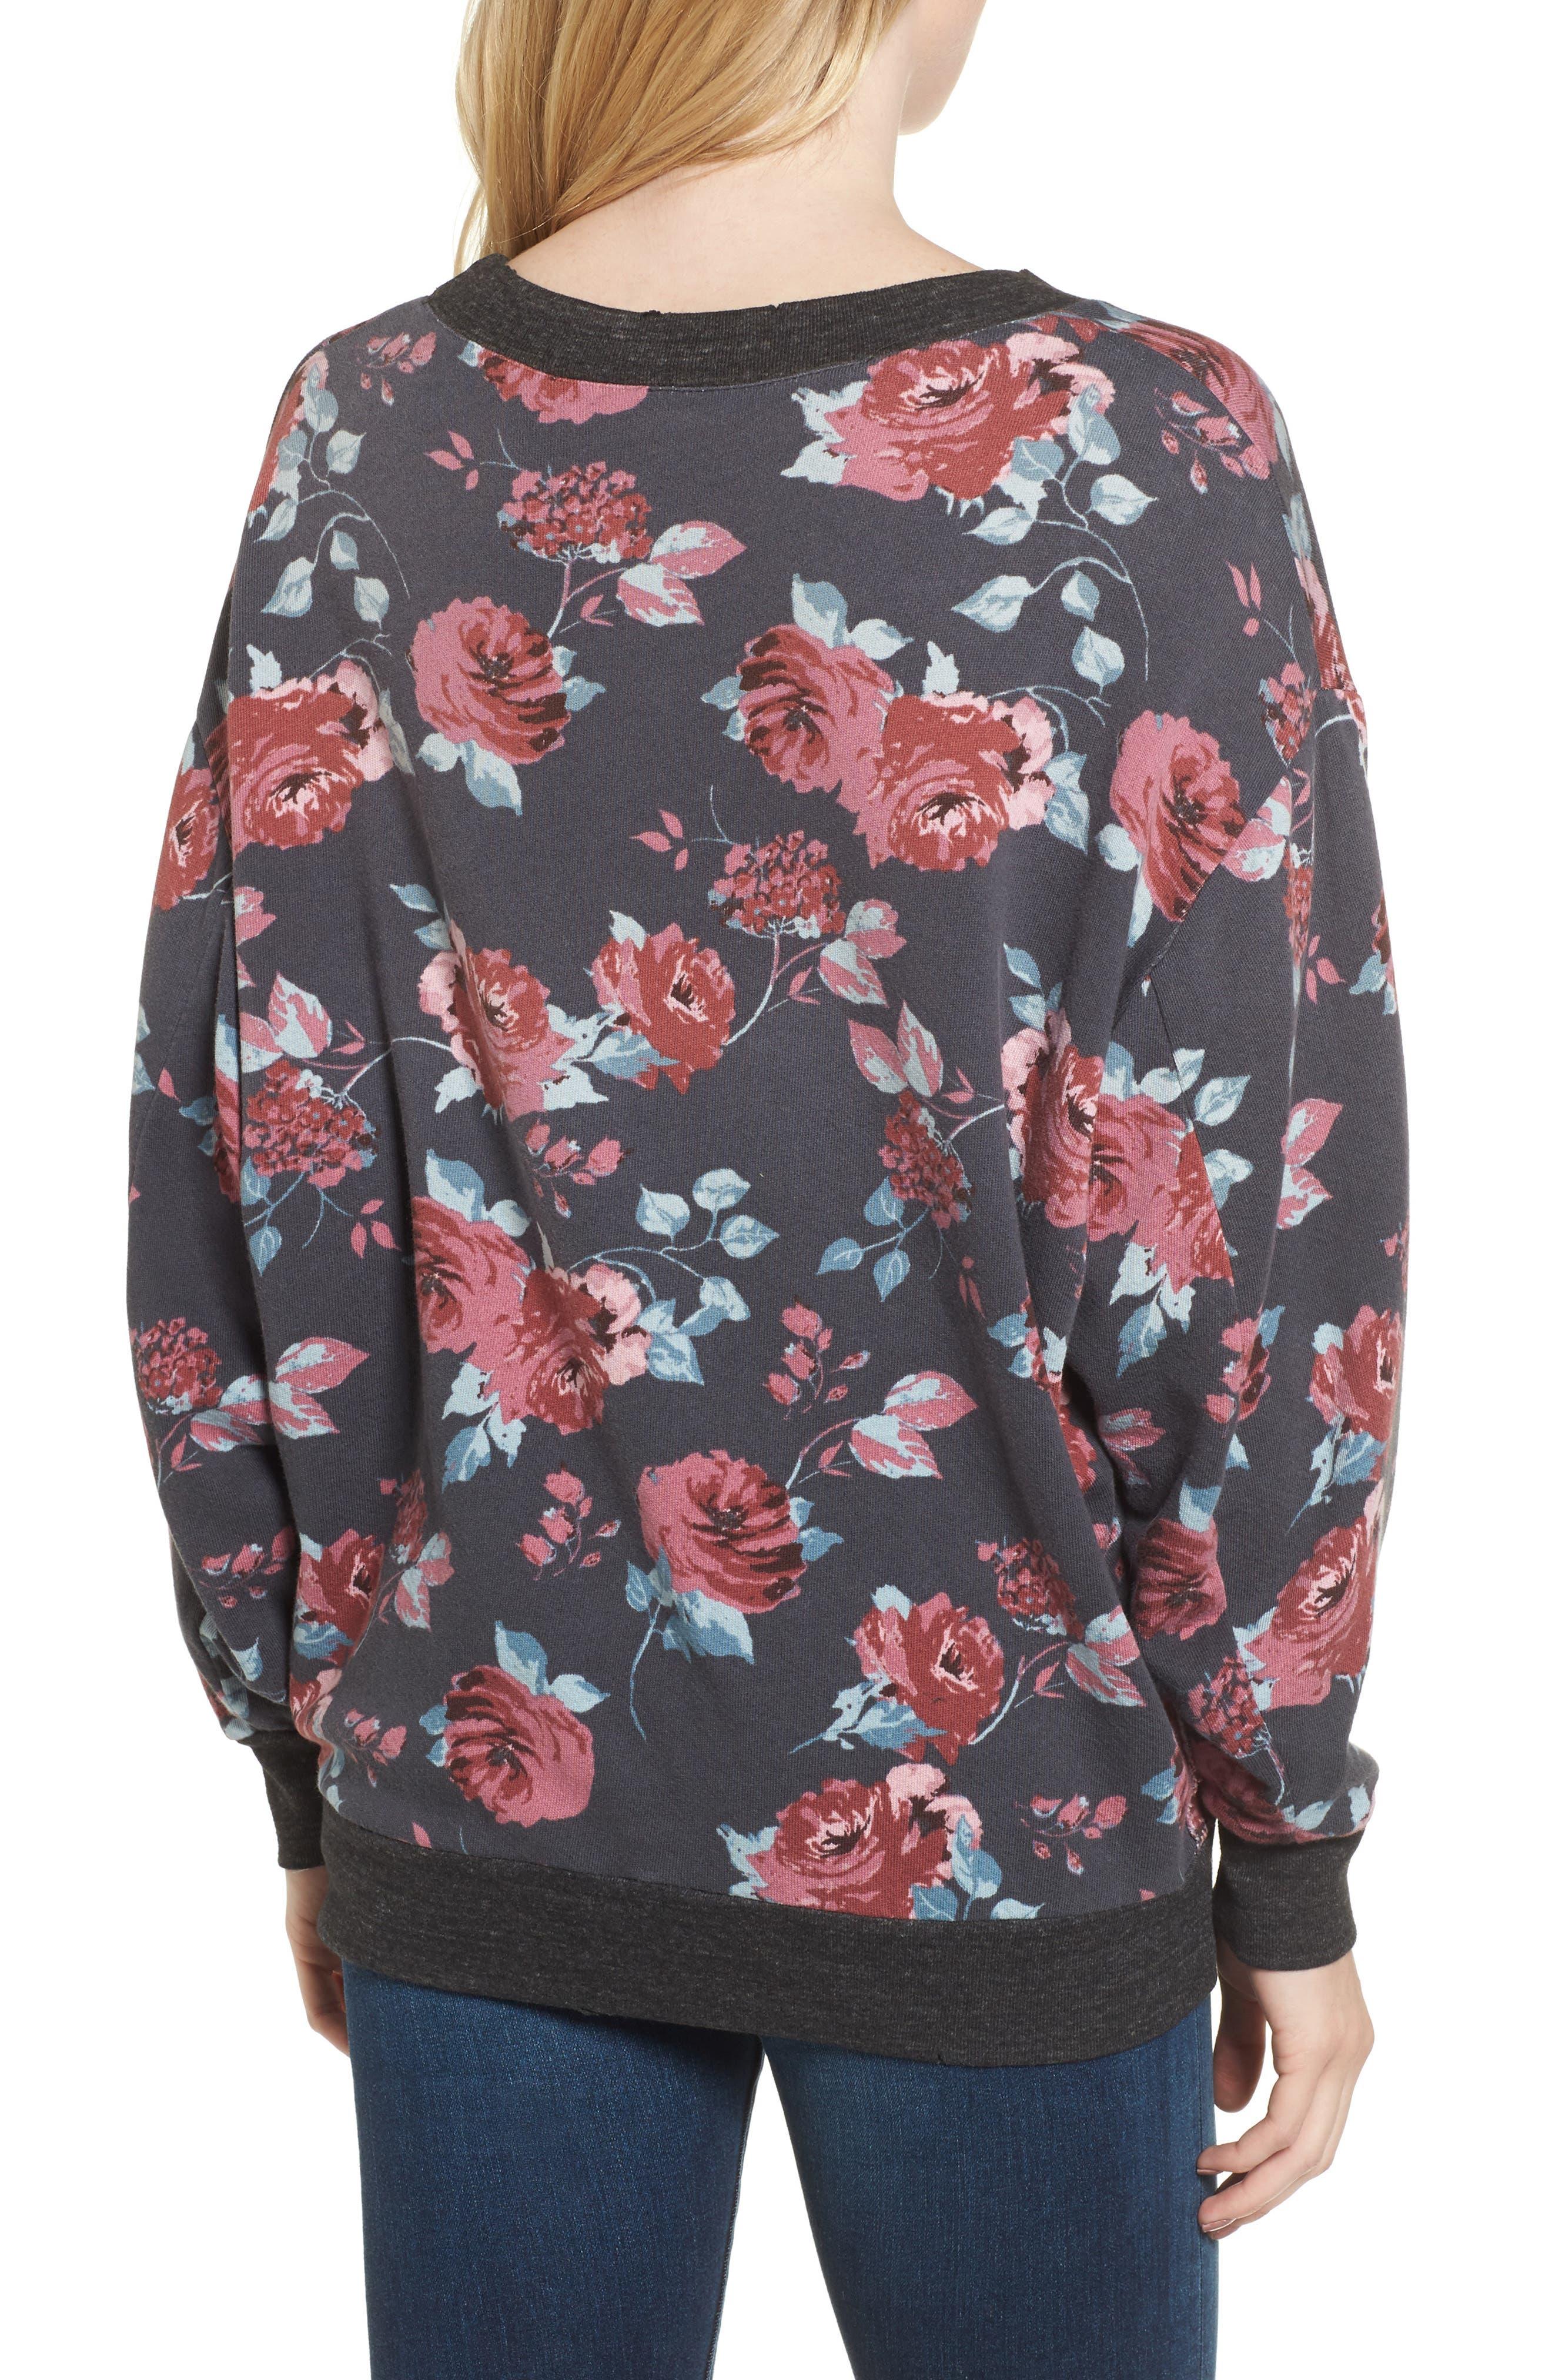 Chelsea Sweatshirt,                             Alternate thumbnail 2, color,                             Pitch Black